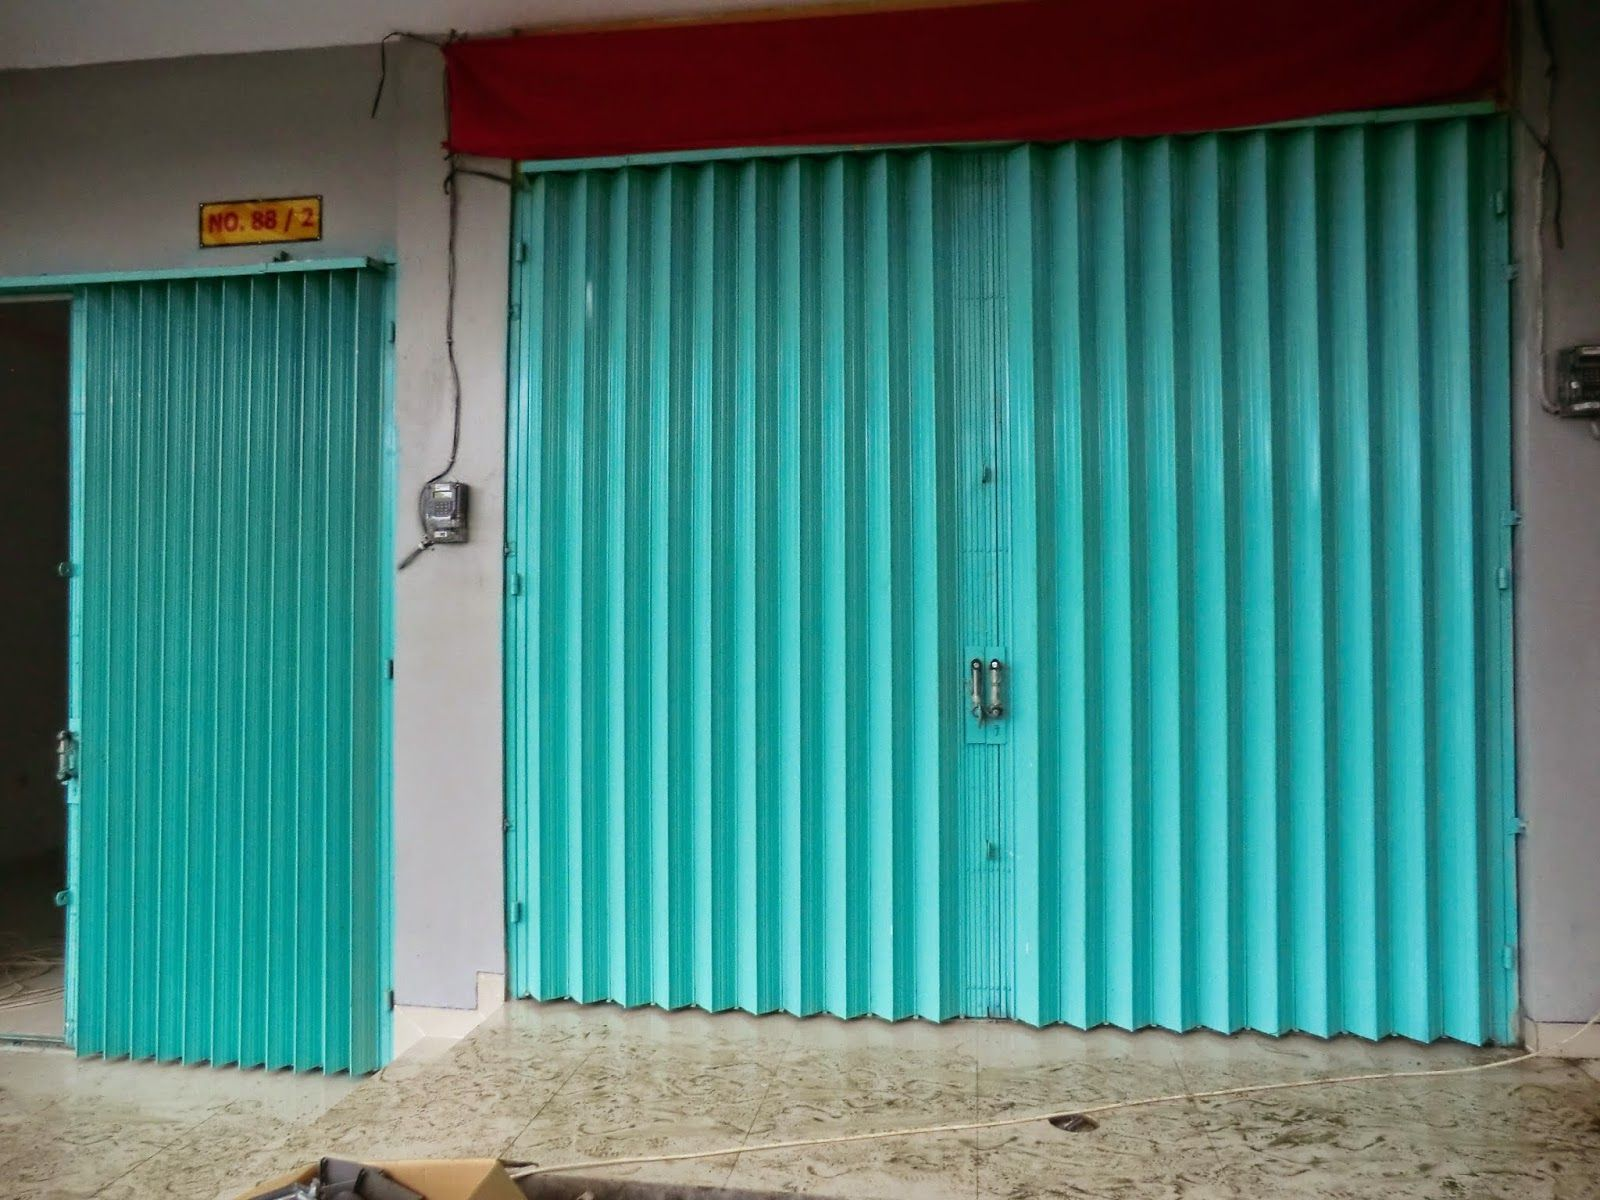 DAFTAR HARGA ROLLING DOOR DAN FOLDING GATE : Harga Folding Gate ...